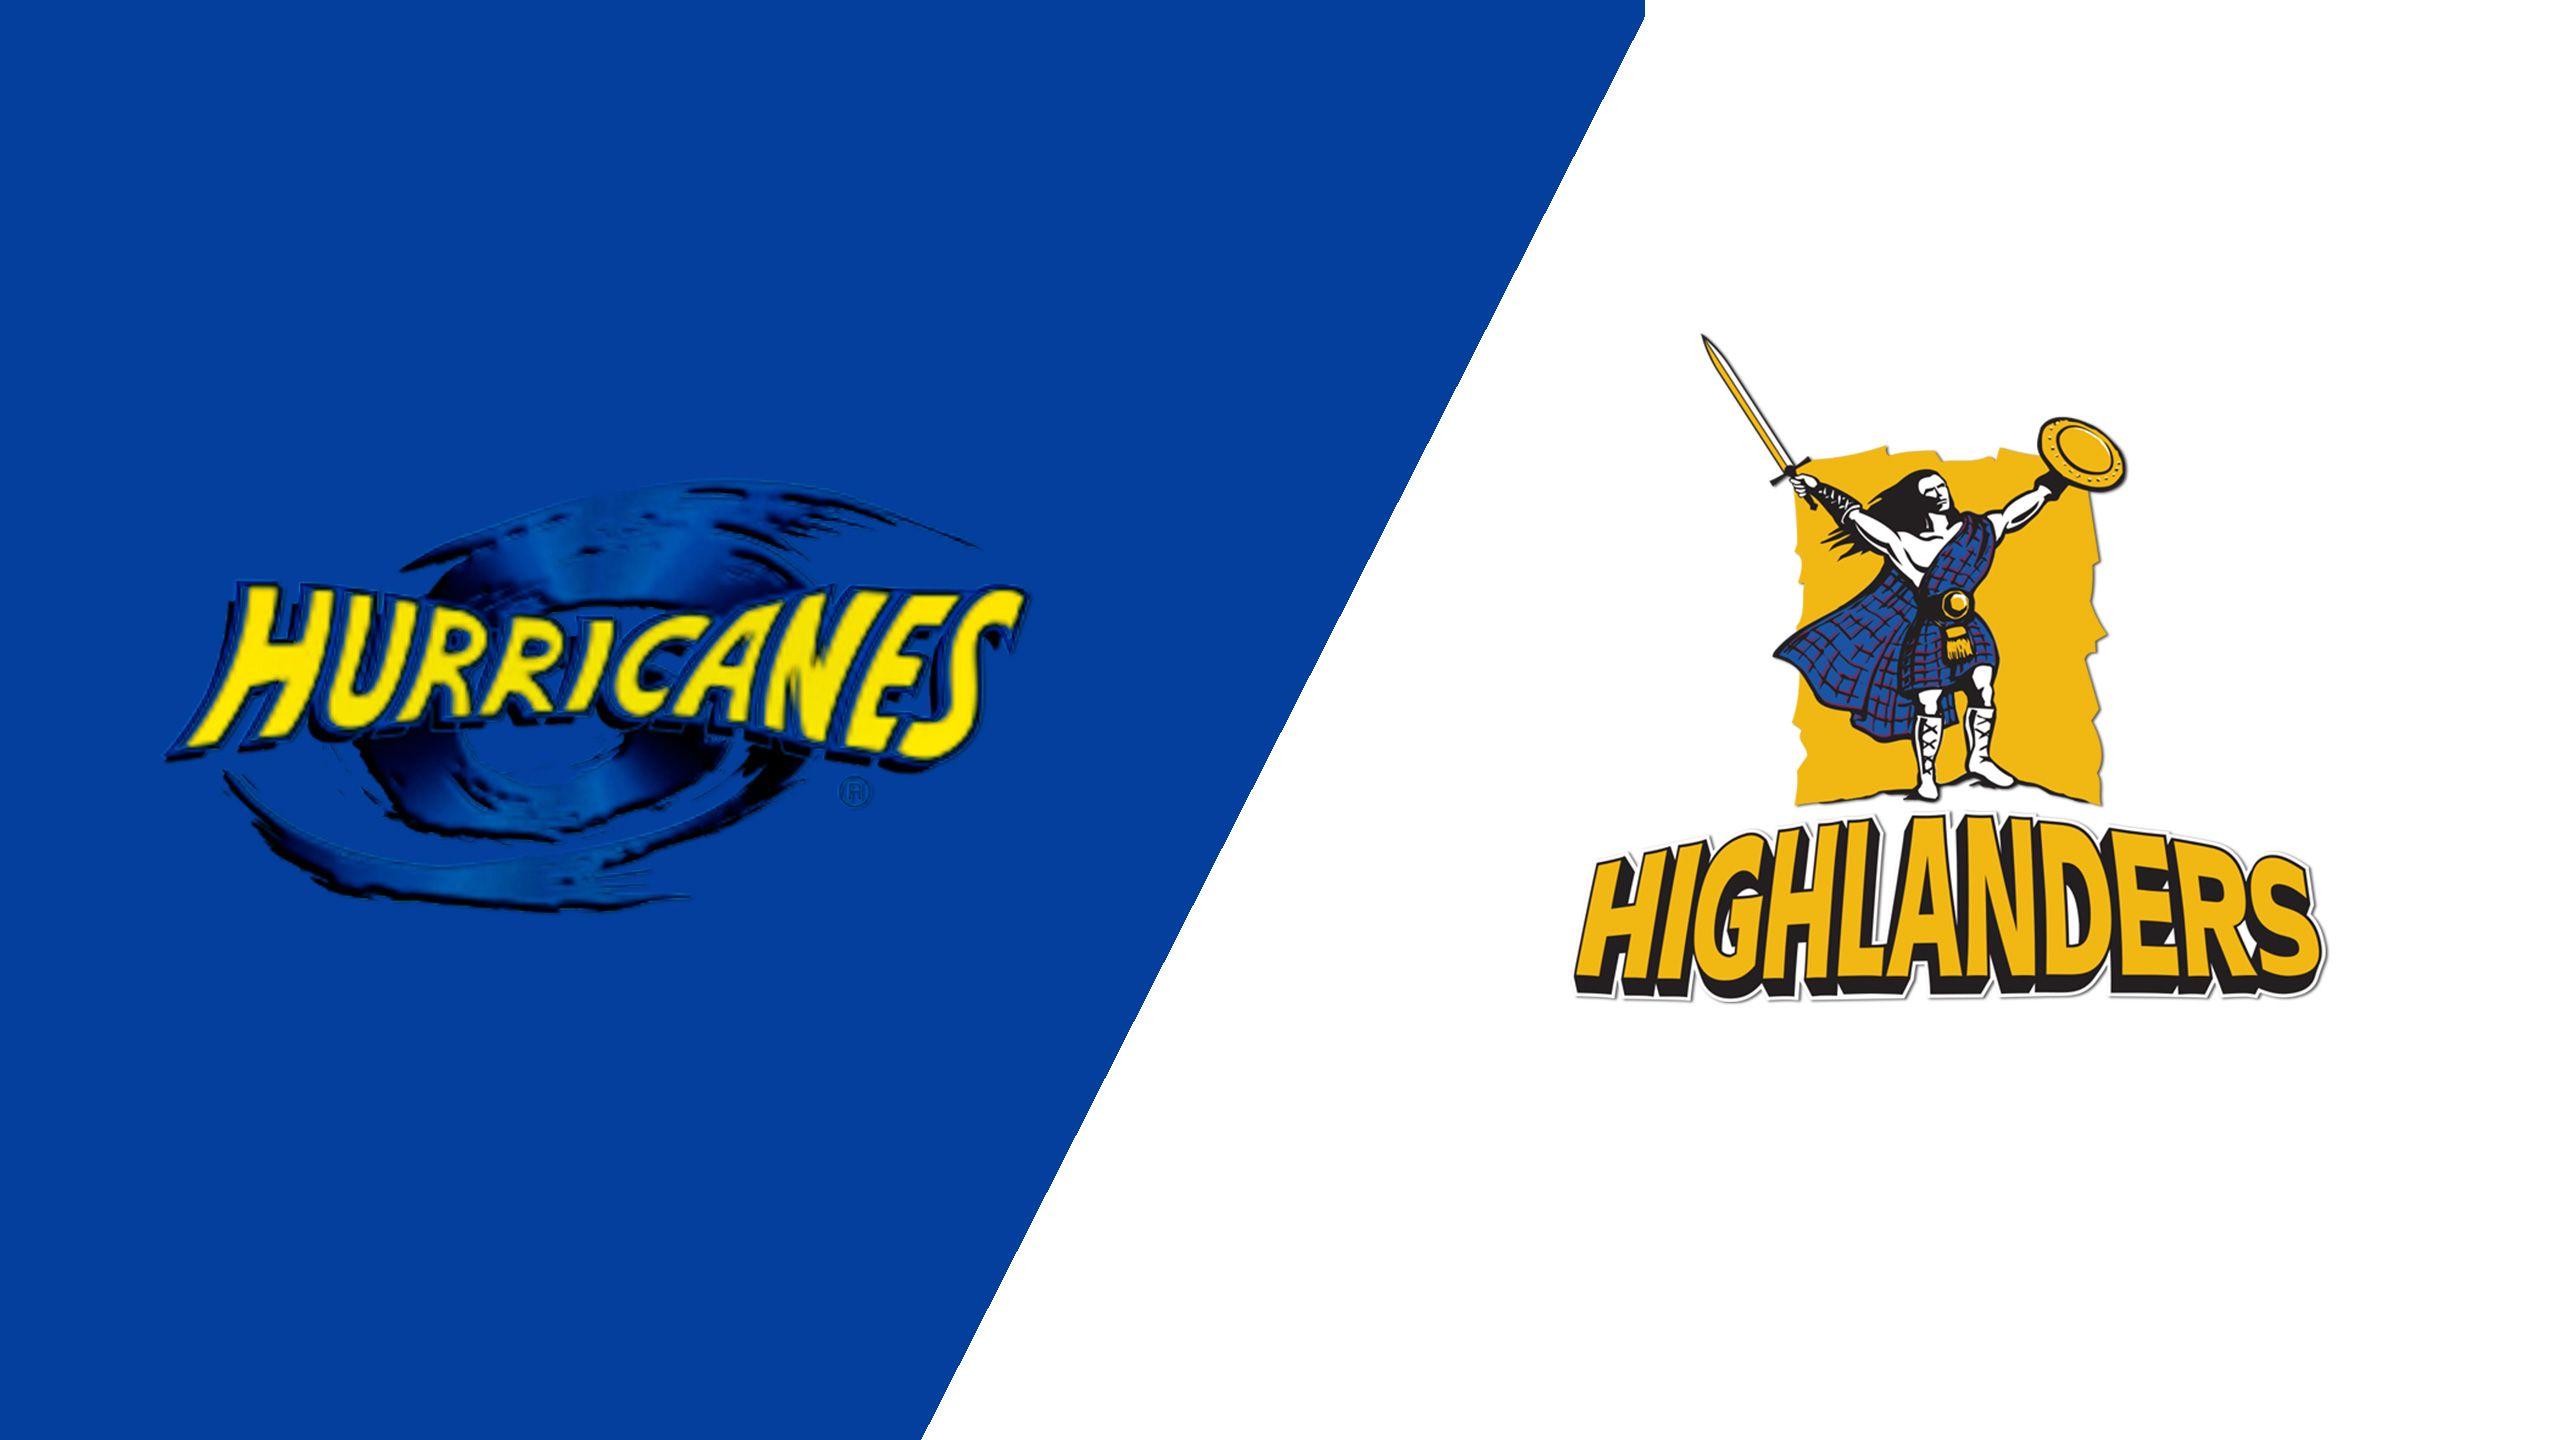 Hurricanes vs. Highlanders (Super Rugby)